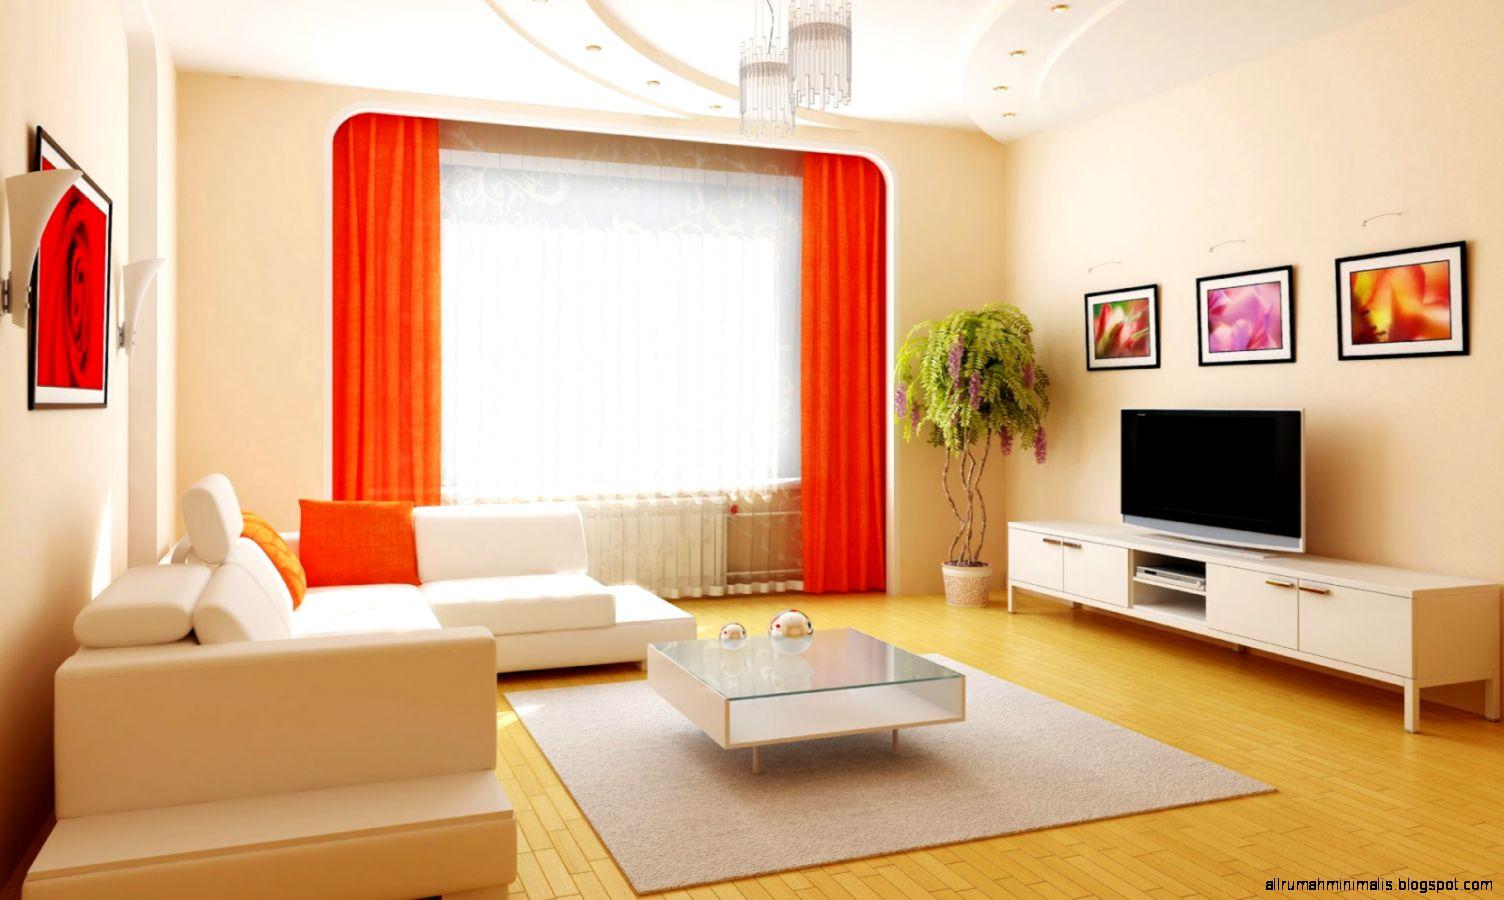 20 Gambar Desain Ruang Keluarga Minimalis Sederhana  Sealkazz Blog